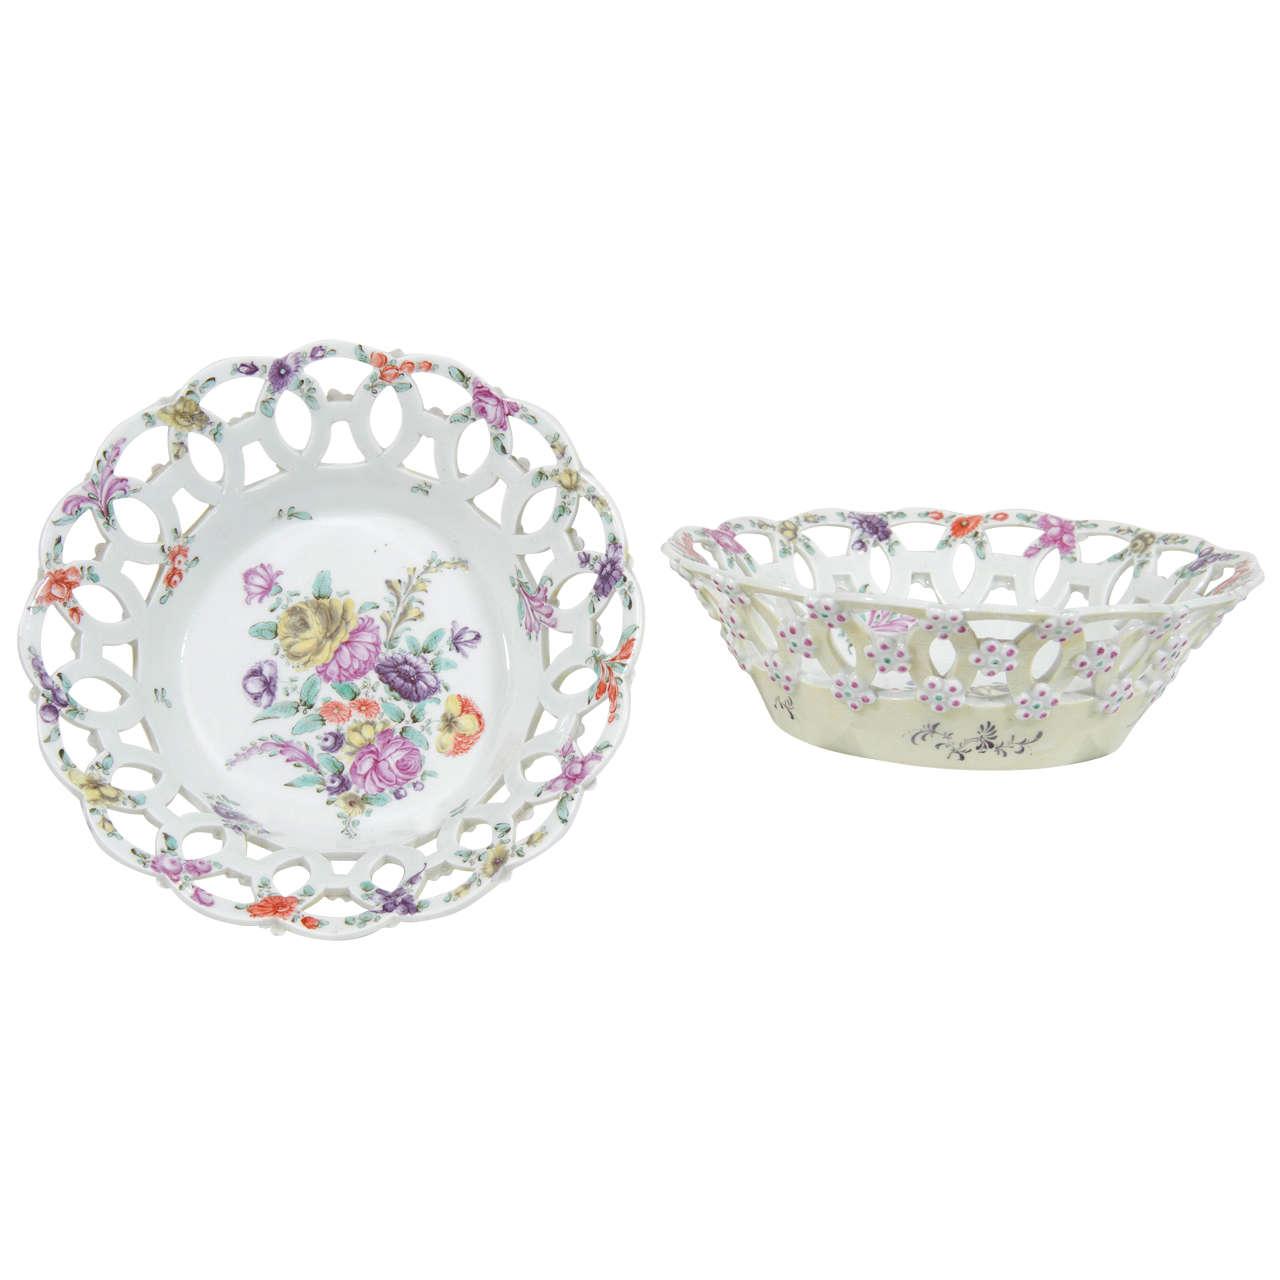 First Period Worcester Porcelain Baskets a Pair